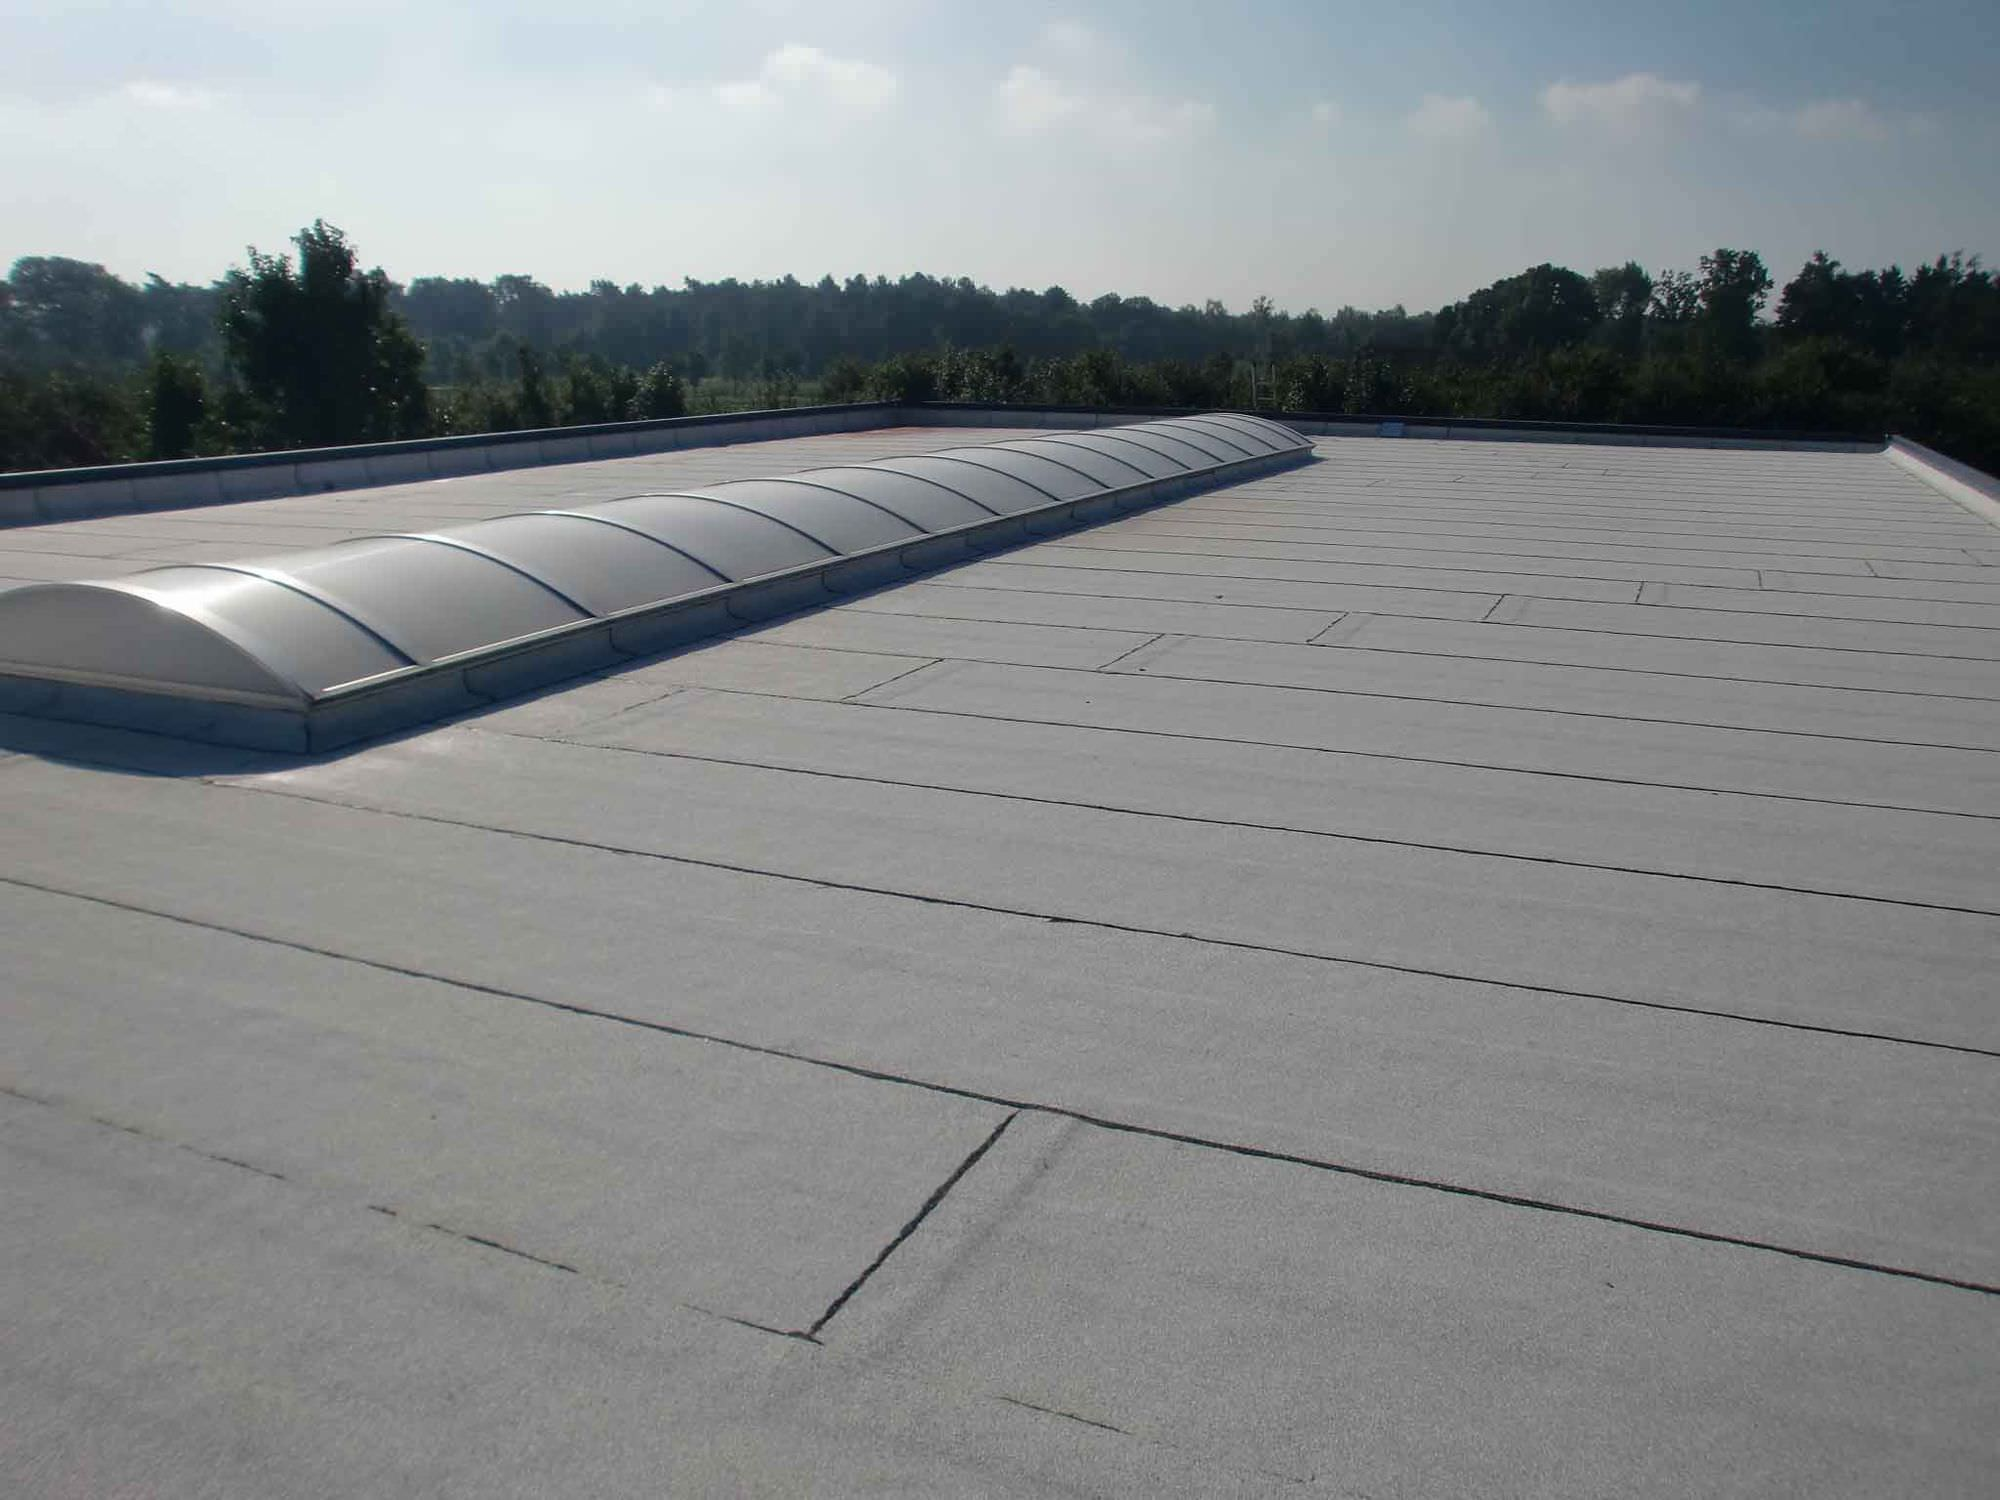 Titanium Waterproofing Membrane / For Roofs / Roll   POLYGUM CARRARA